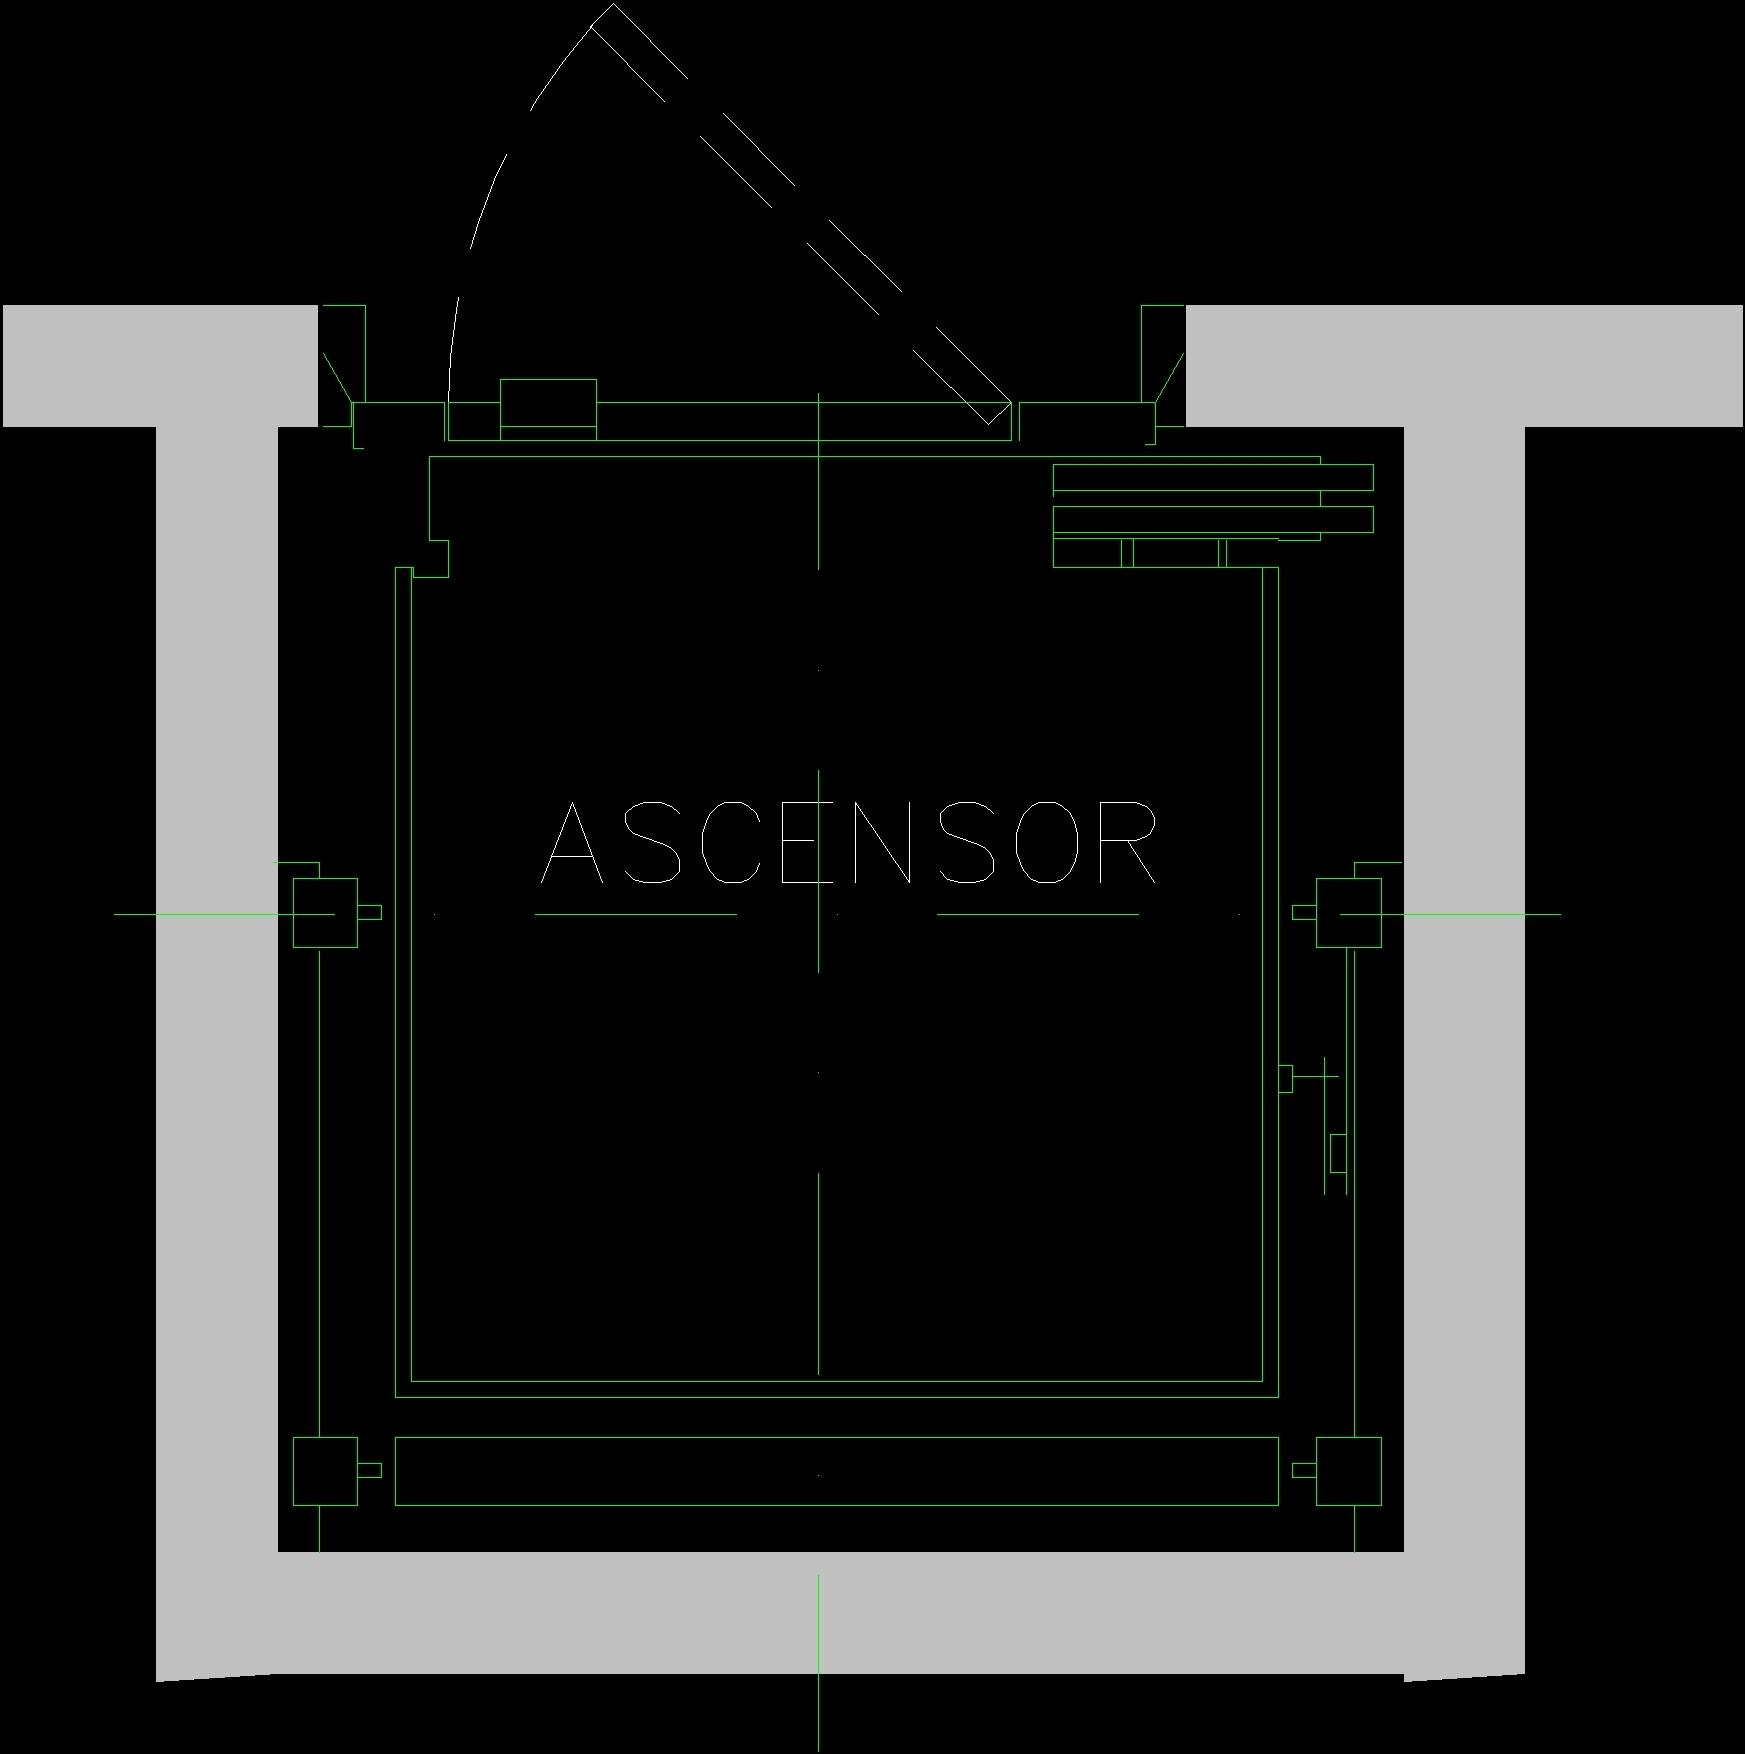 Elevator Dwg Block For Autocad Designs Cad